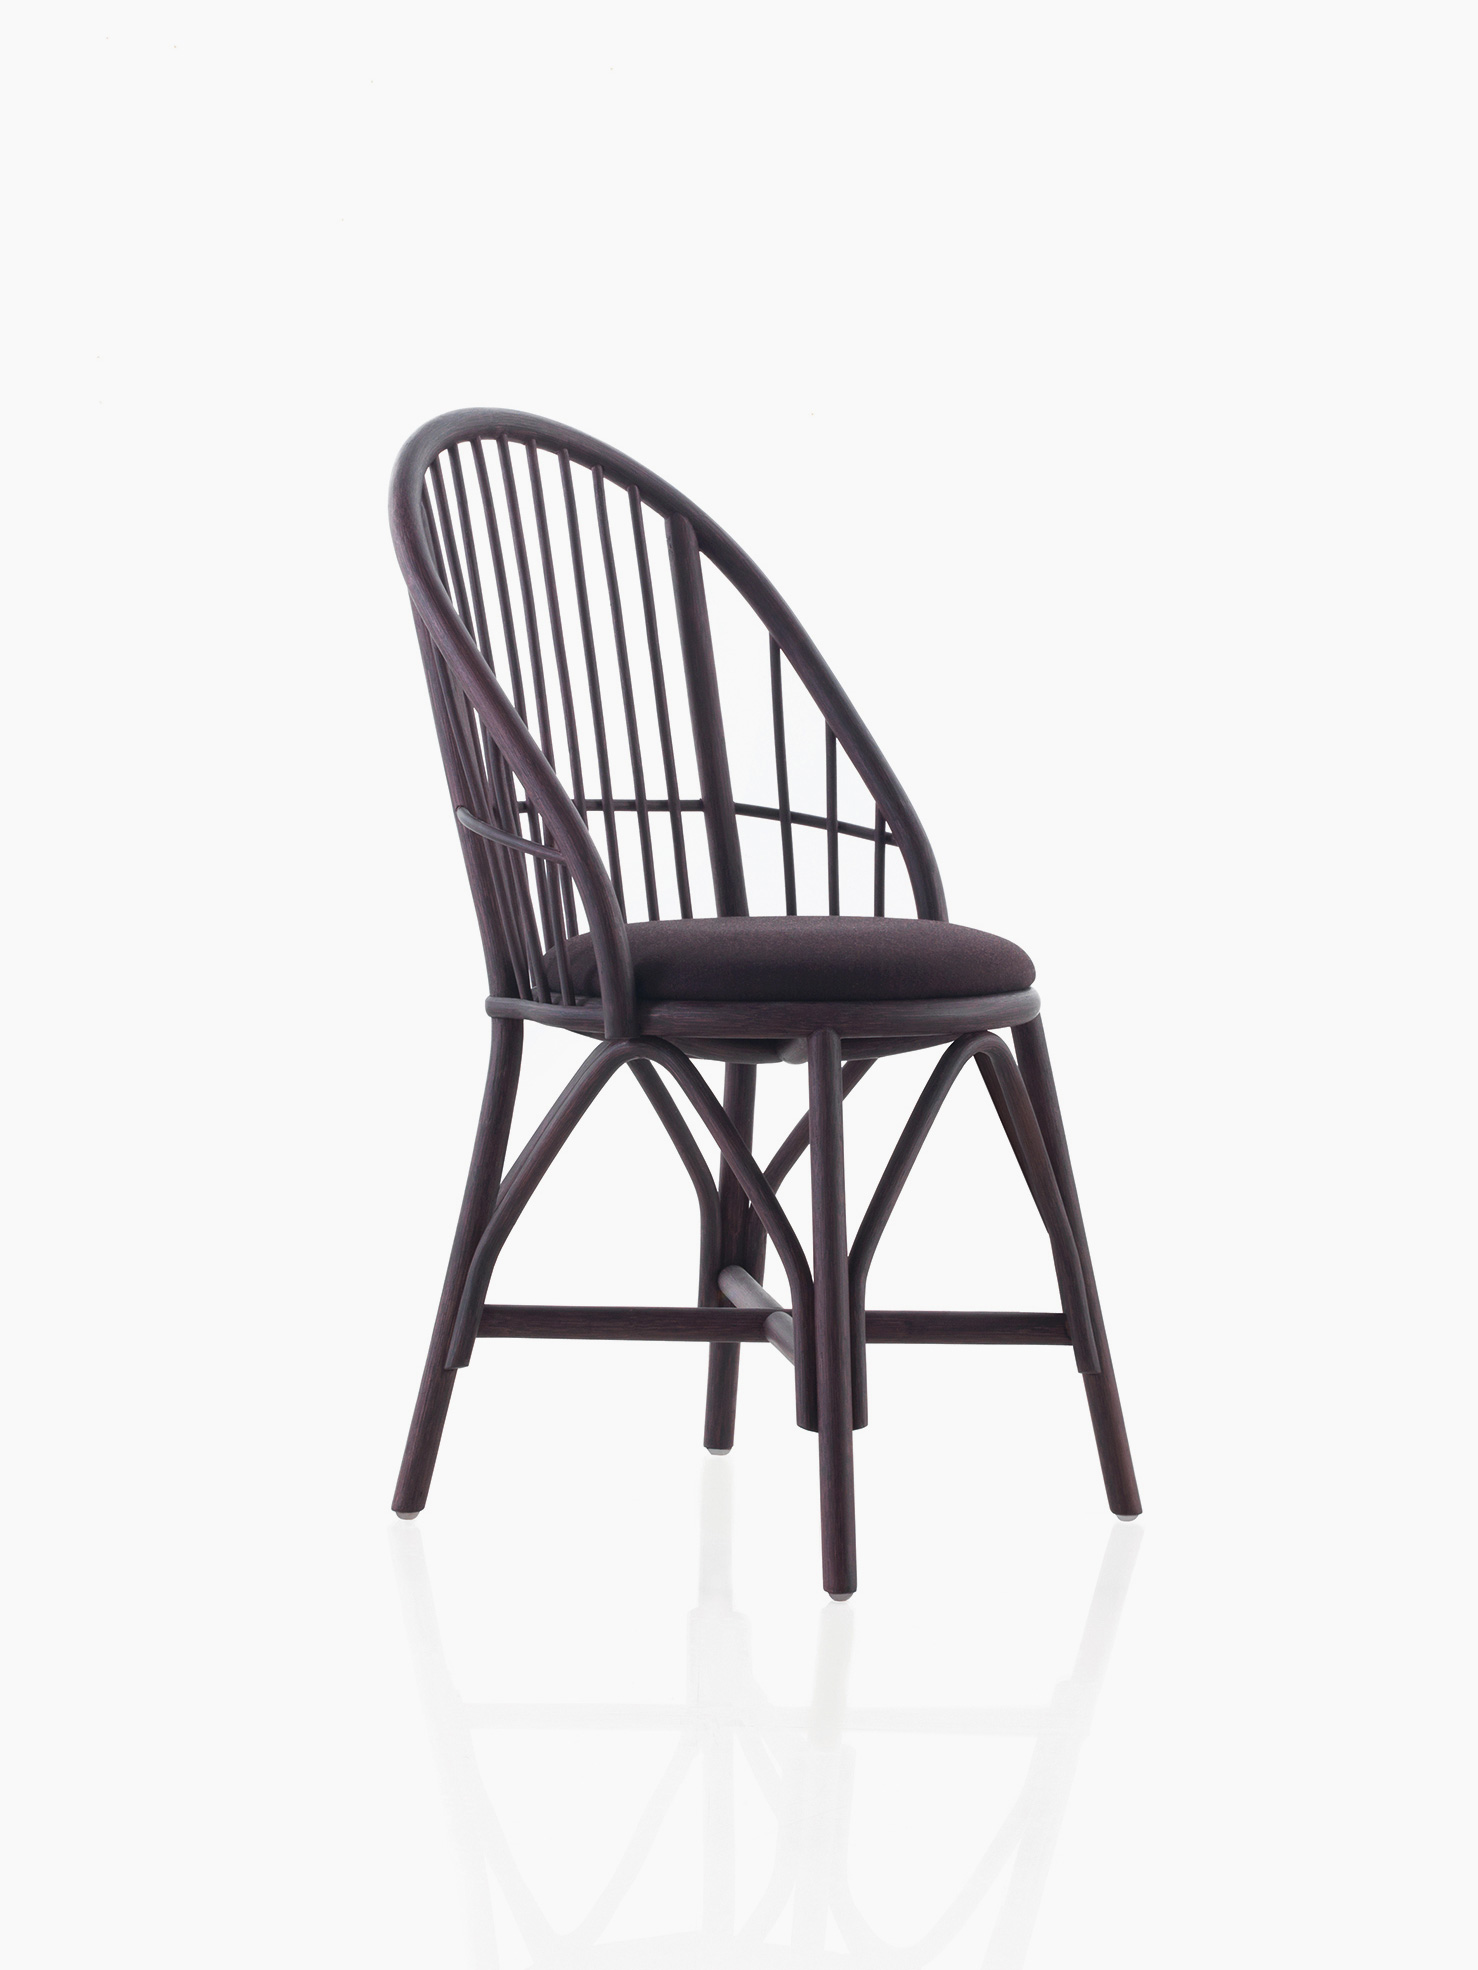 Expormim-coqueta-dining-chair-04